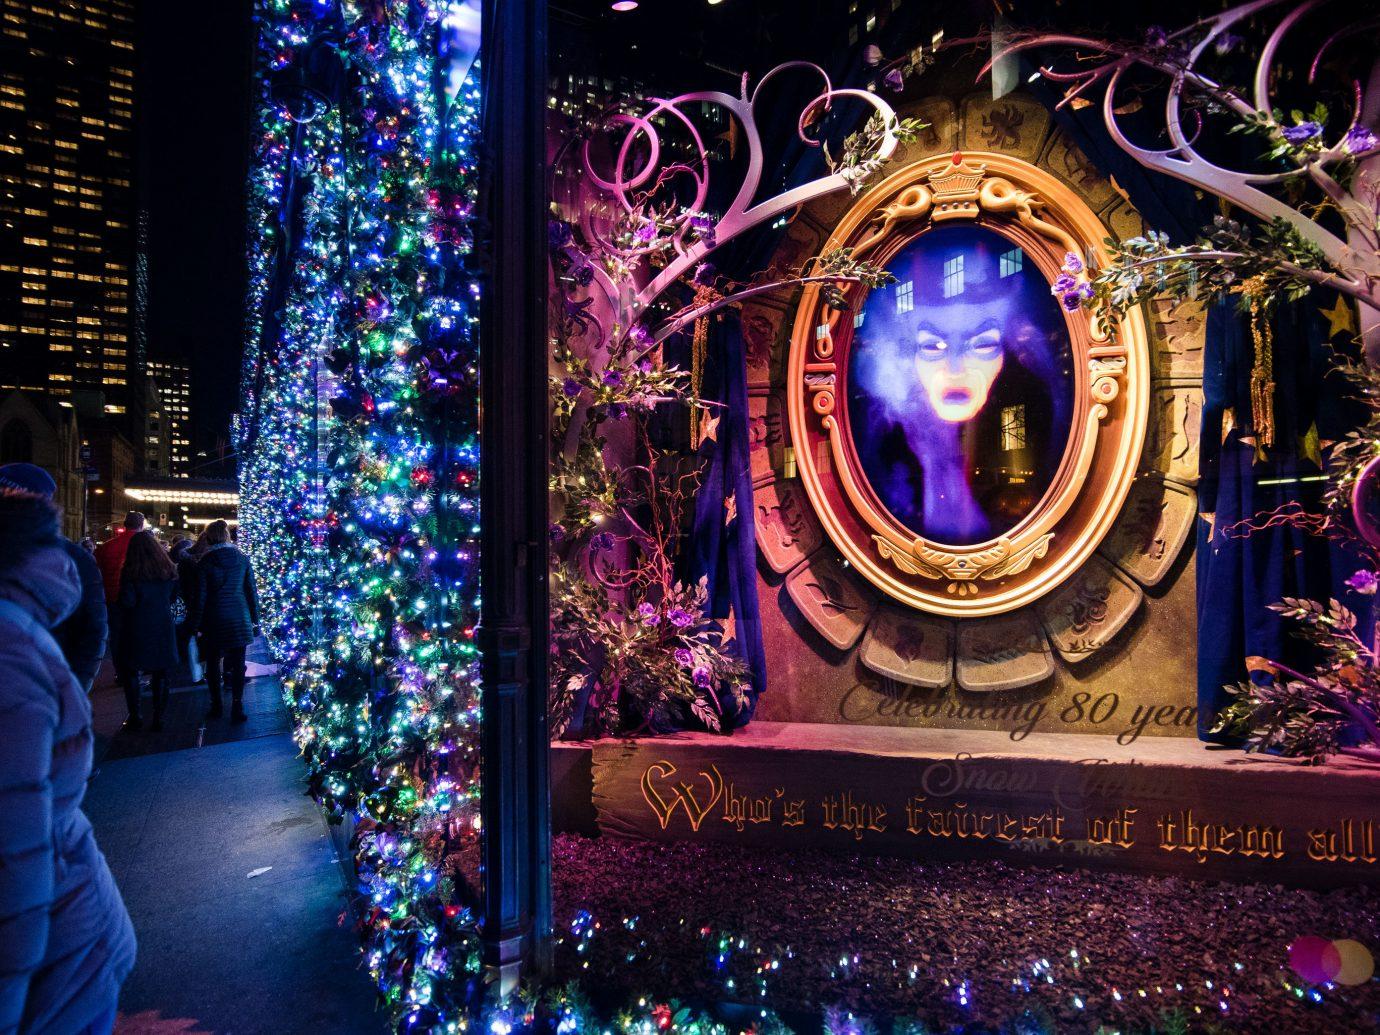 Offbeat Winter purple light festival lighting christmas decoration night christmas lights tradition event Christmas fête decor computer wallpaper world colorful